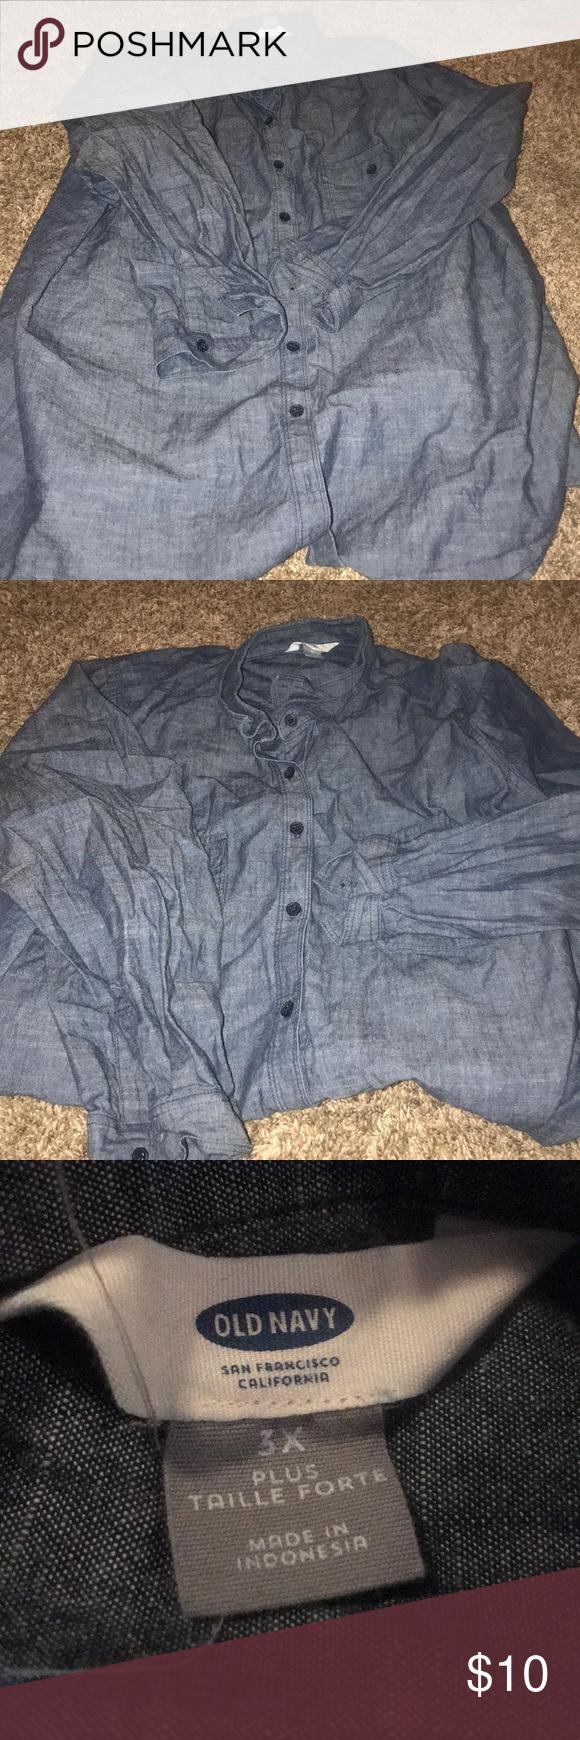 1b1a4bae7 Plus Size Denim Shirt Old Navy - DREAMWORKS